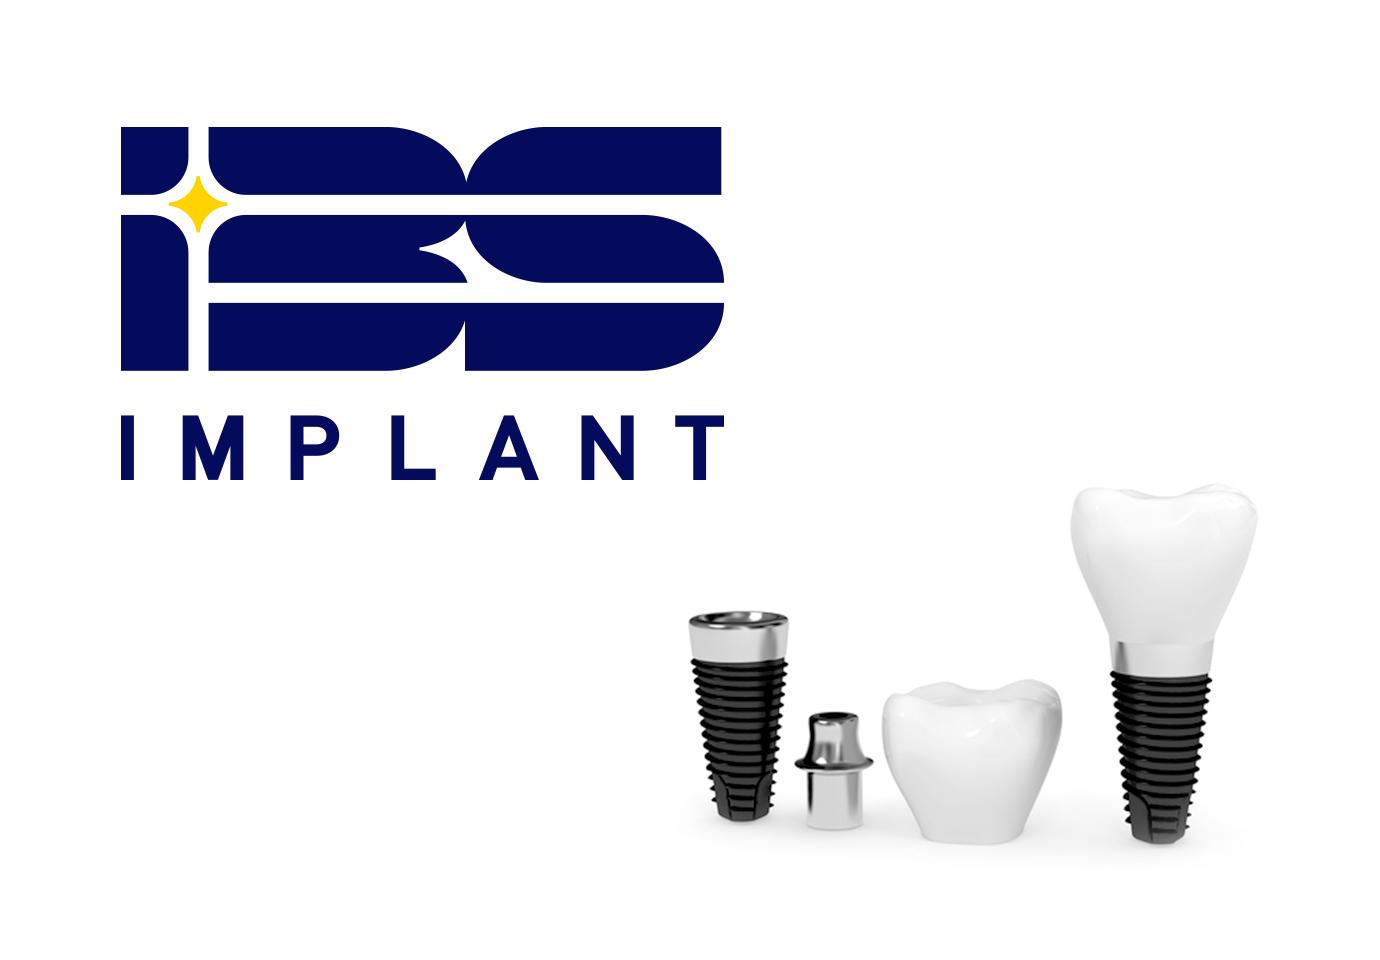 formation en implants dentaires IBS implant Corée